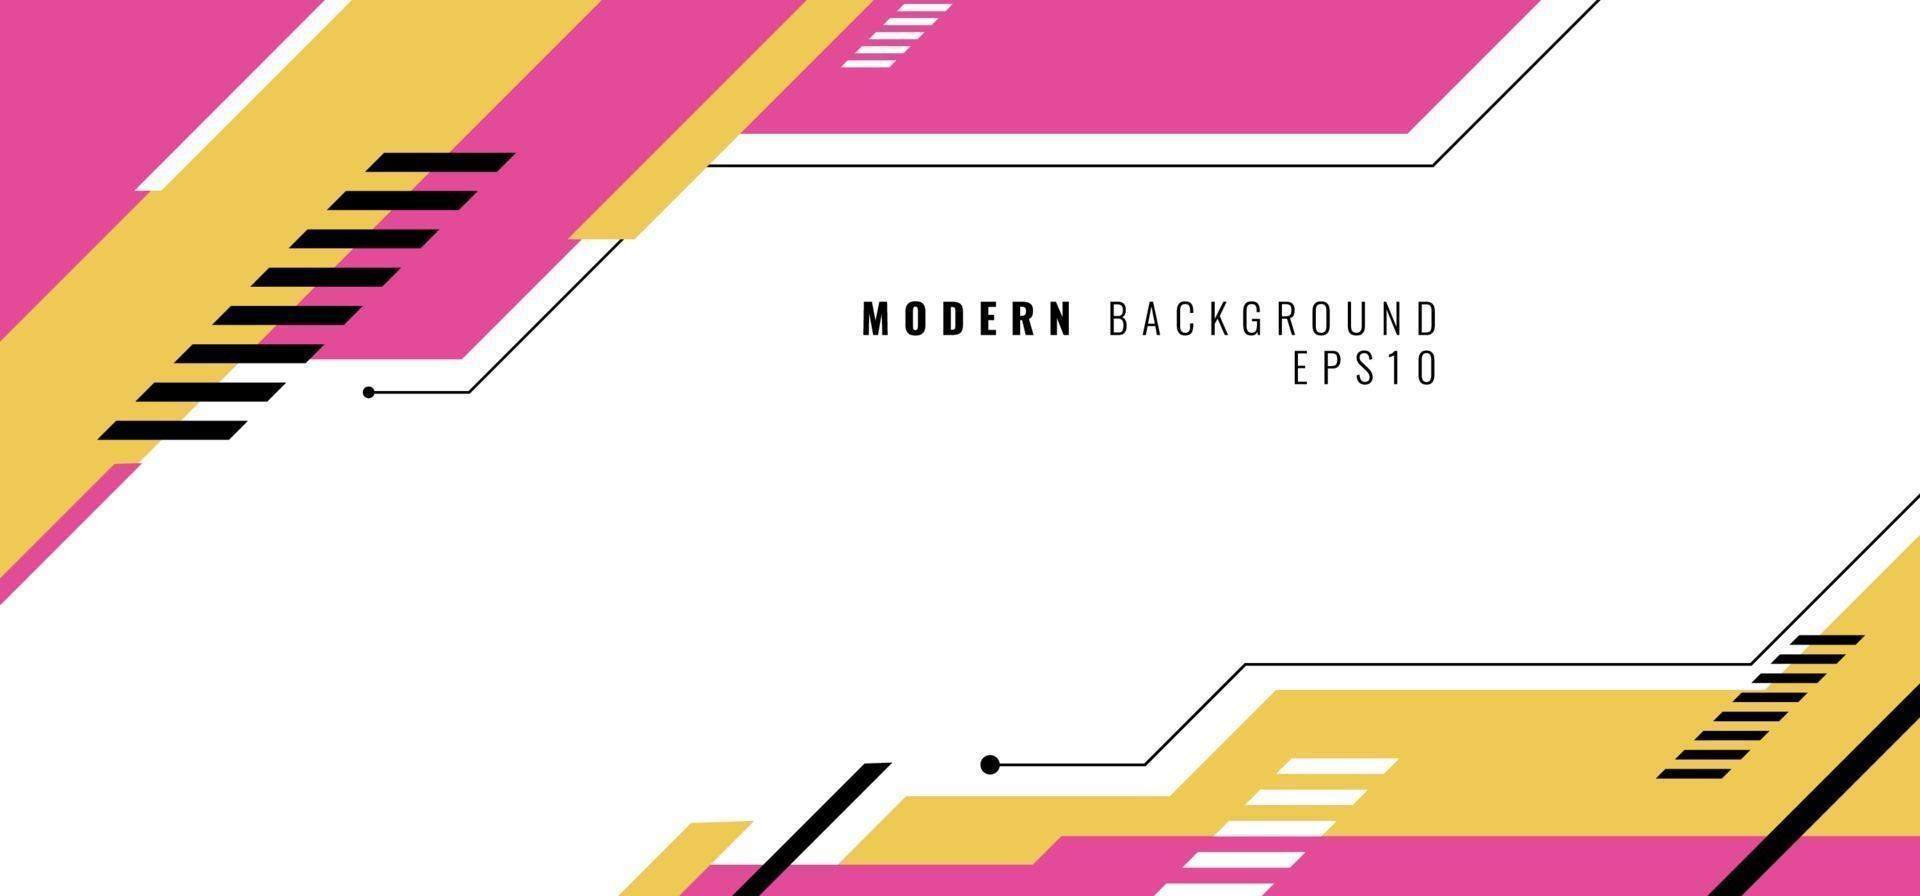 banner webbdesign mall rosa och gul geometrisk design på vit bakgrund vektor